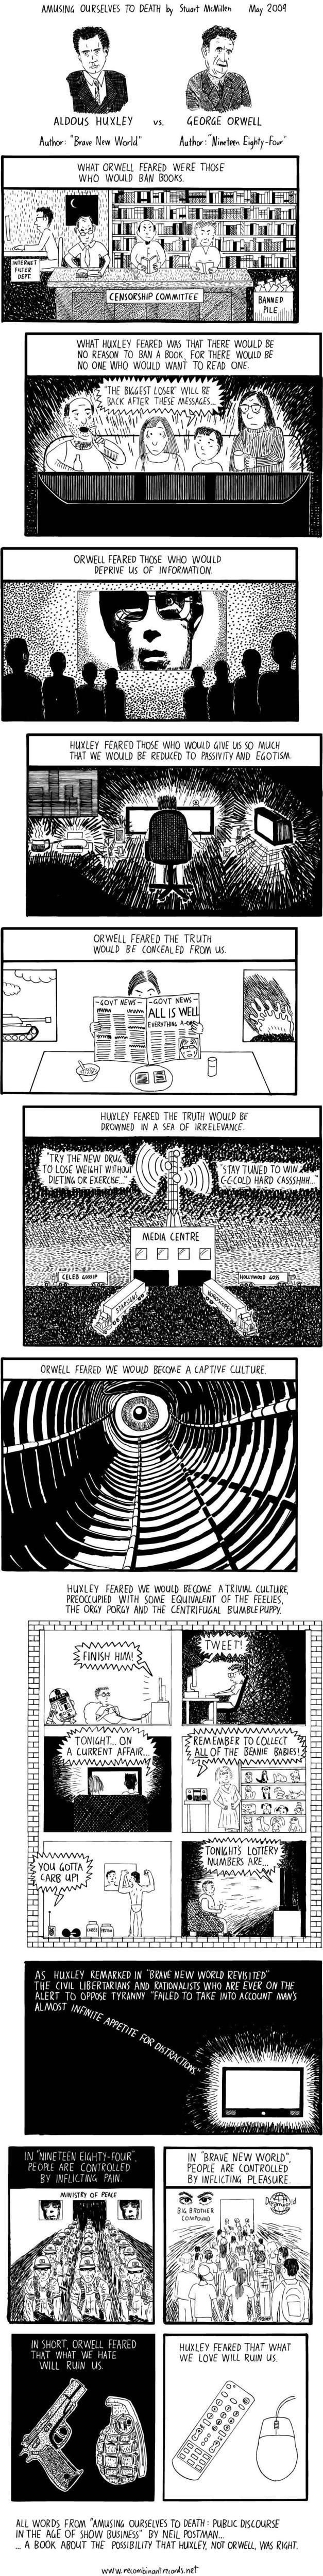 BraveNewWorld or 1984.jpg